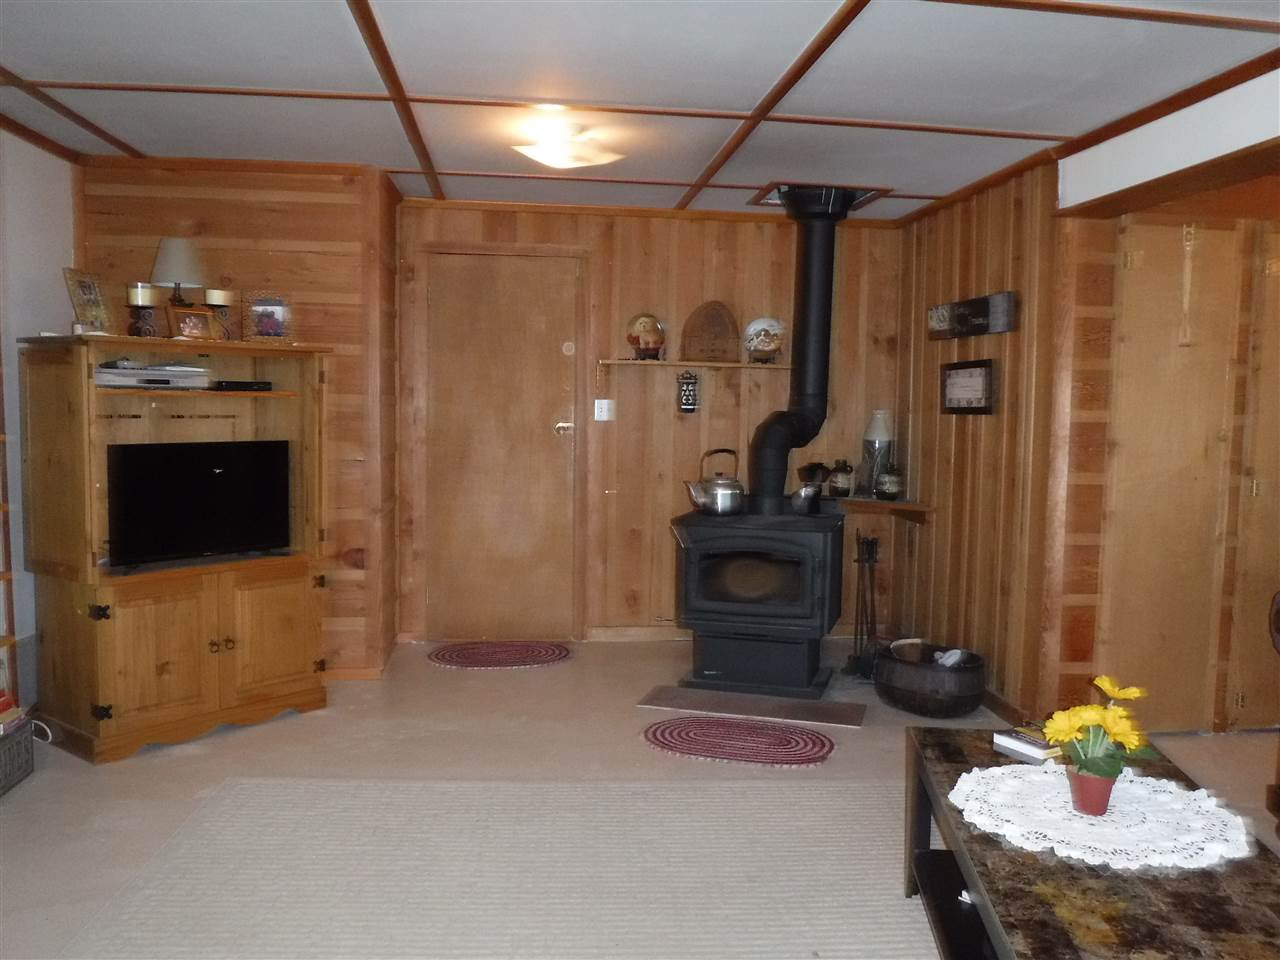 Photo 29: Photos: 3126 ELSEY Road in Williams Lake: Williams Lake - Rural West House for sale (Williams Lake (Zone 27))  : MLS®# R2467730